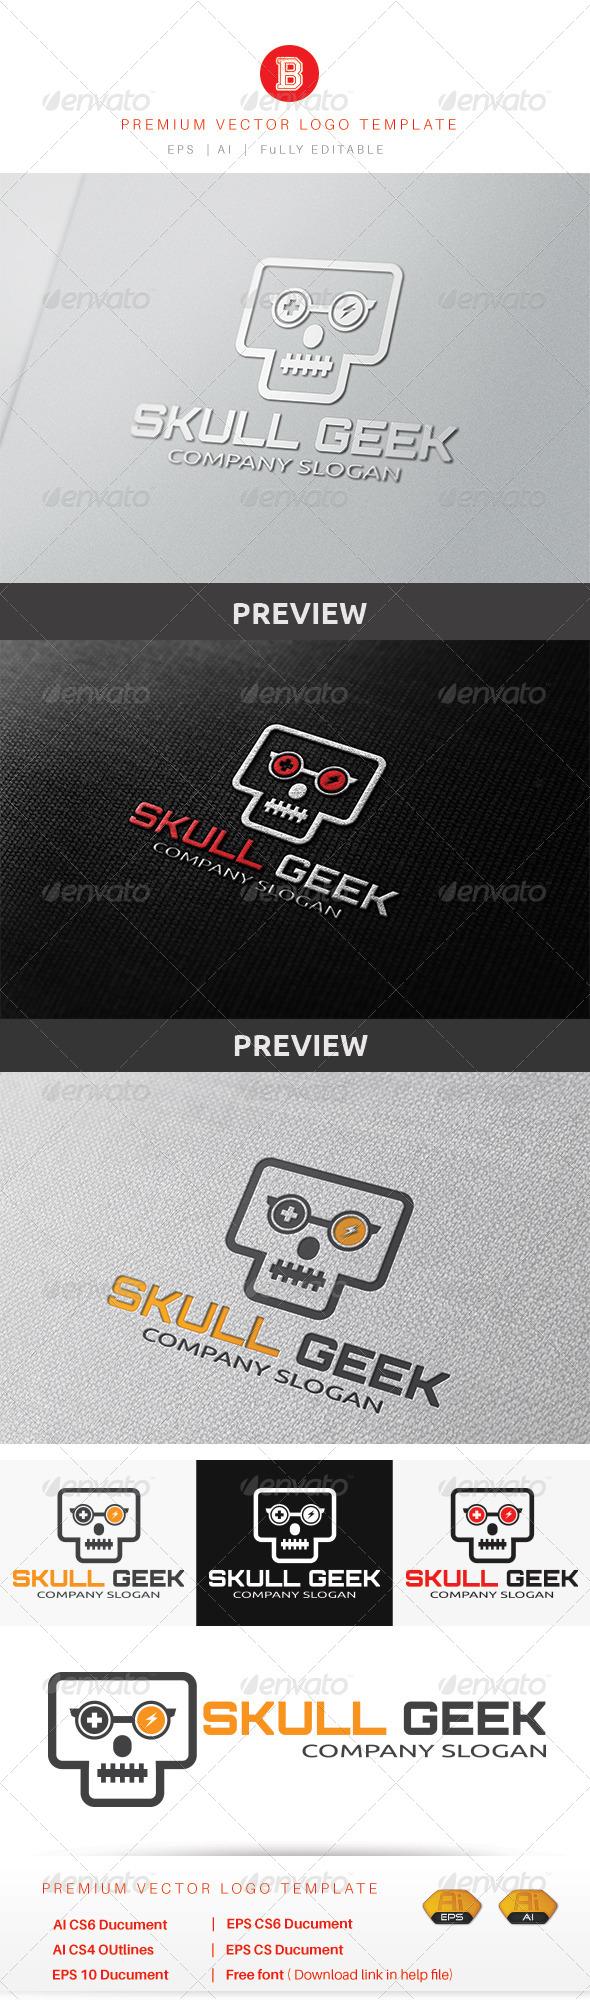 GraphicRiver Skull Geek 8560871